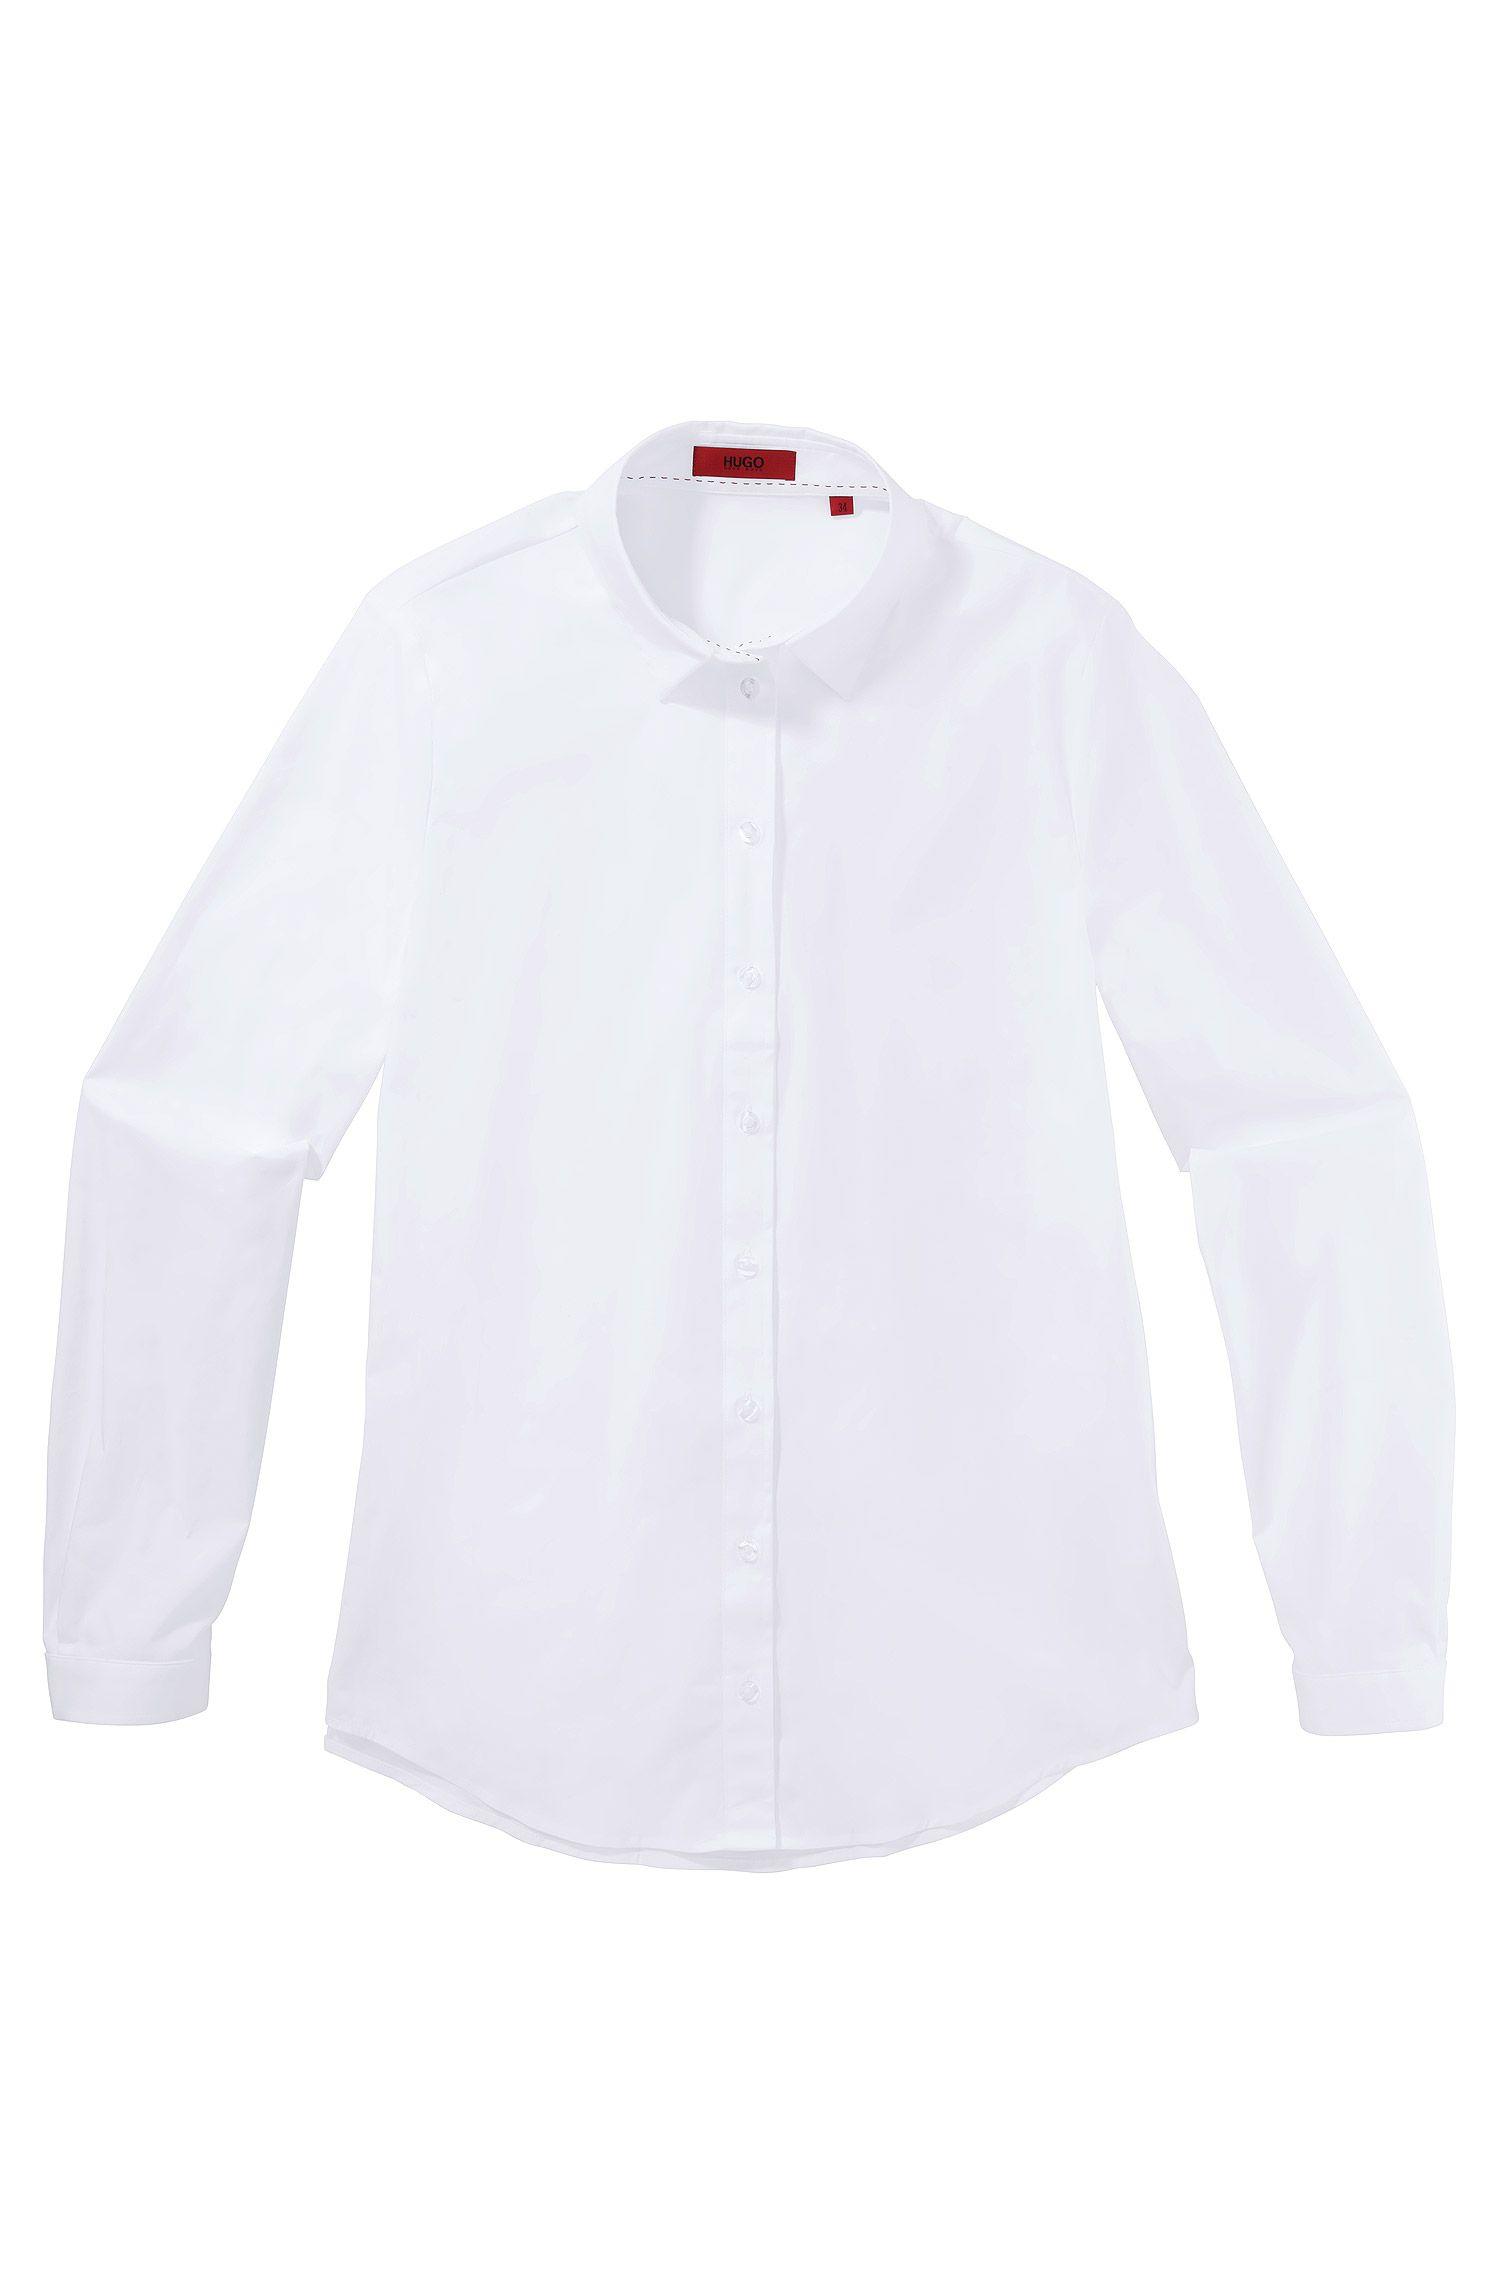 Bluse ´Eselia` aus Baumwoll-Mix